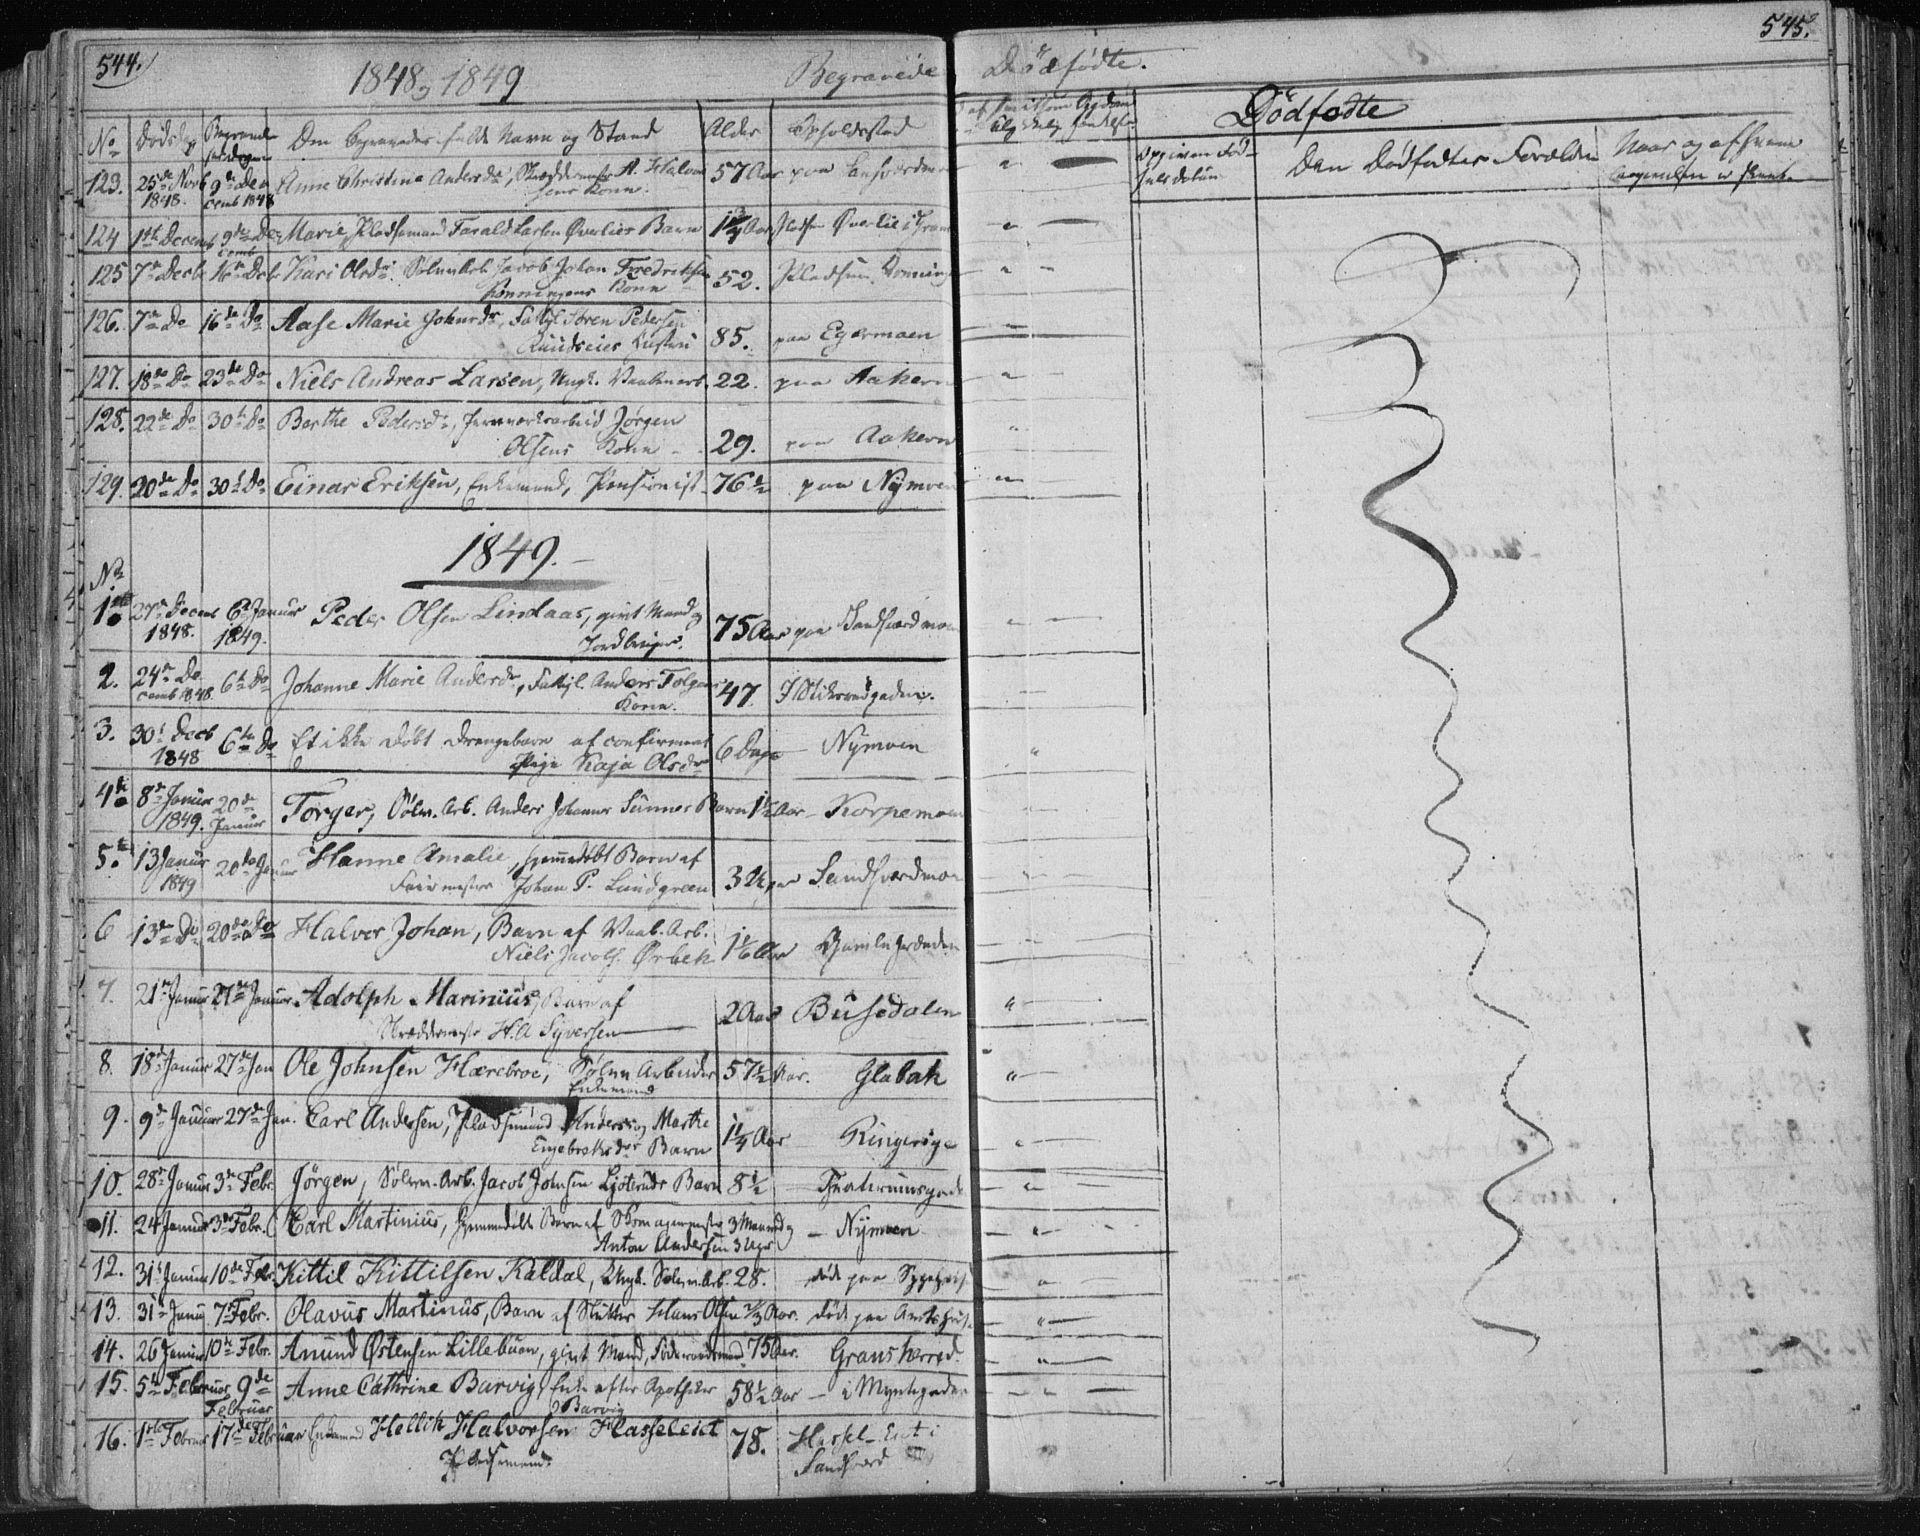 SAKO, Kongsberg kirkebøker, F/Fa/L0009: Parish register (official) no. I 9, 1839-1858, p. 544-545